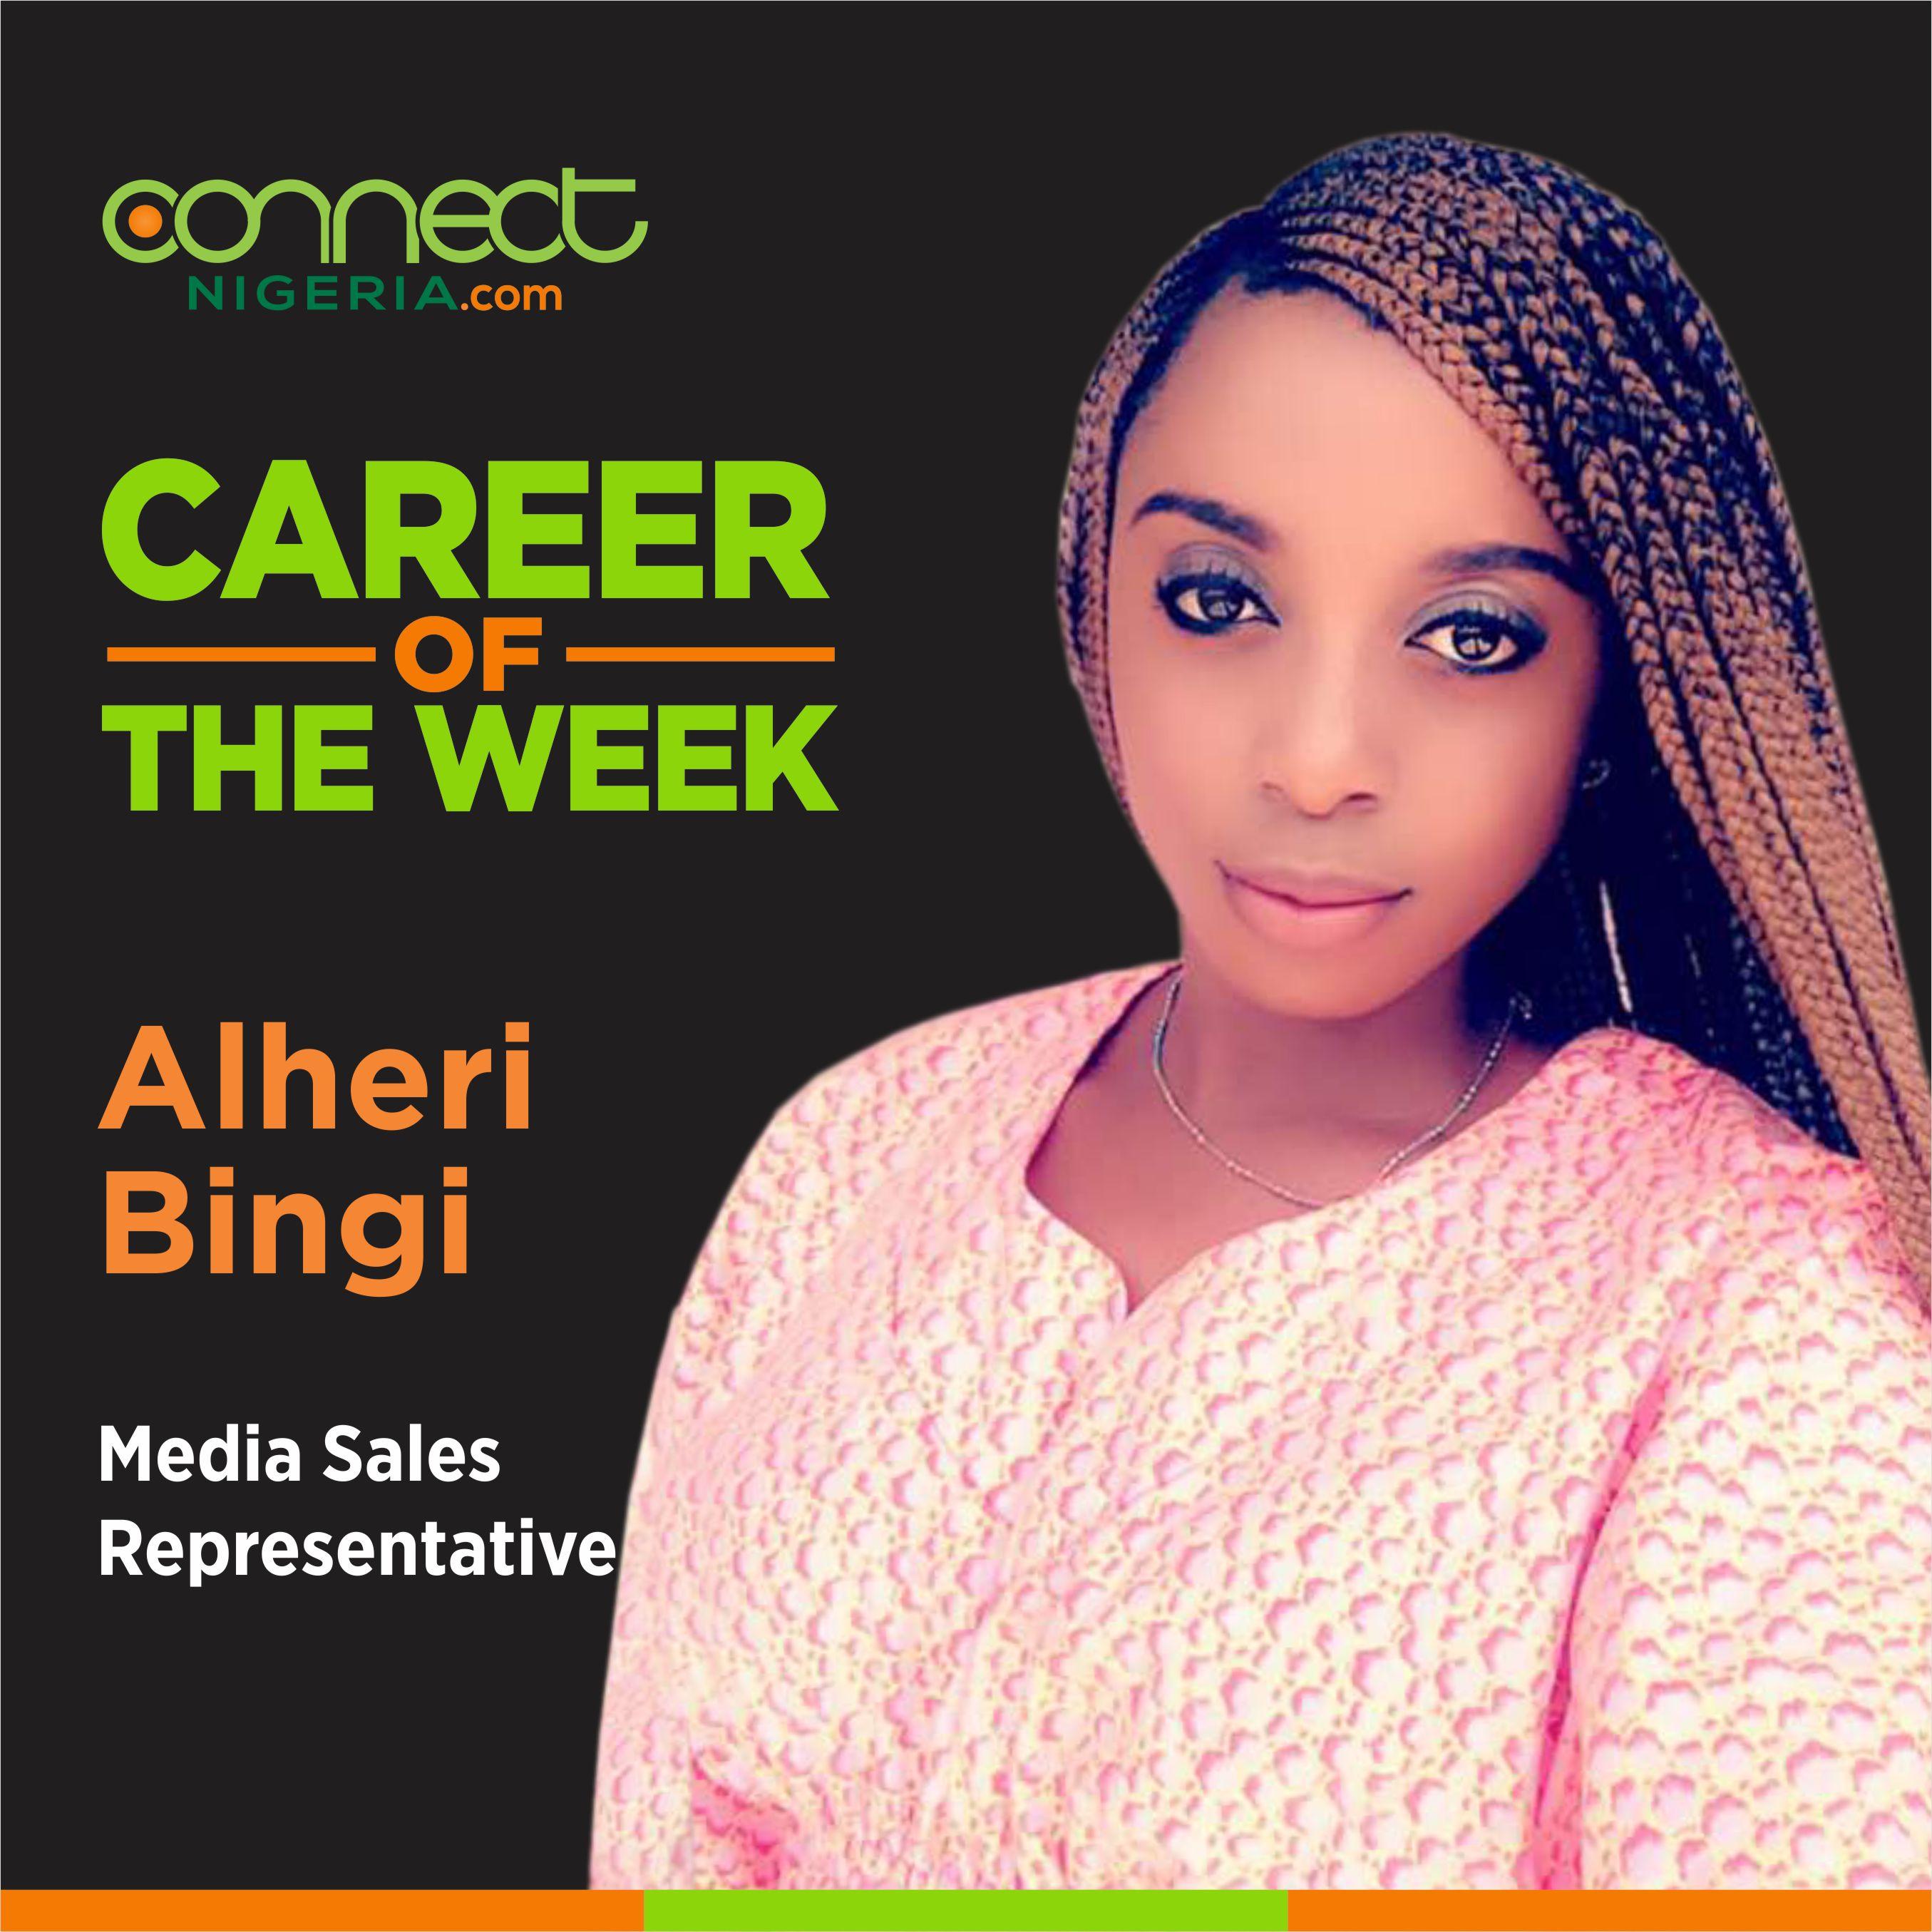 Career of the Week – Alheri Bingi, Media Sales Representative - www.connectnigeria.com